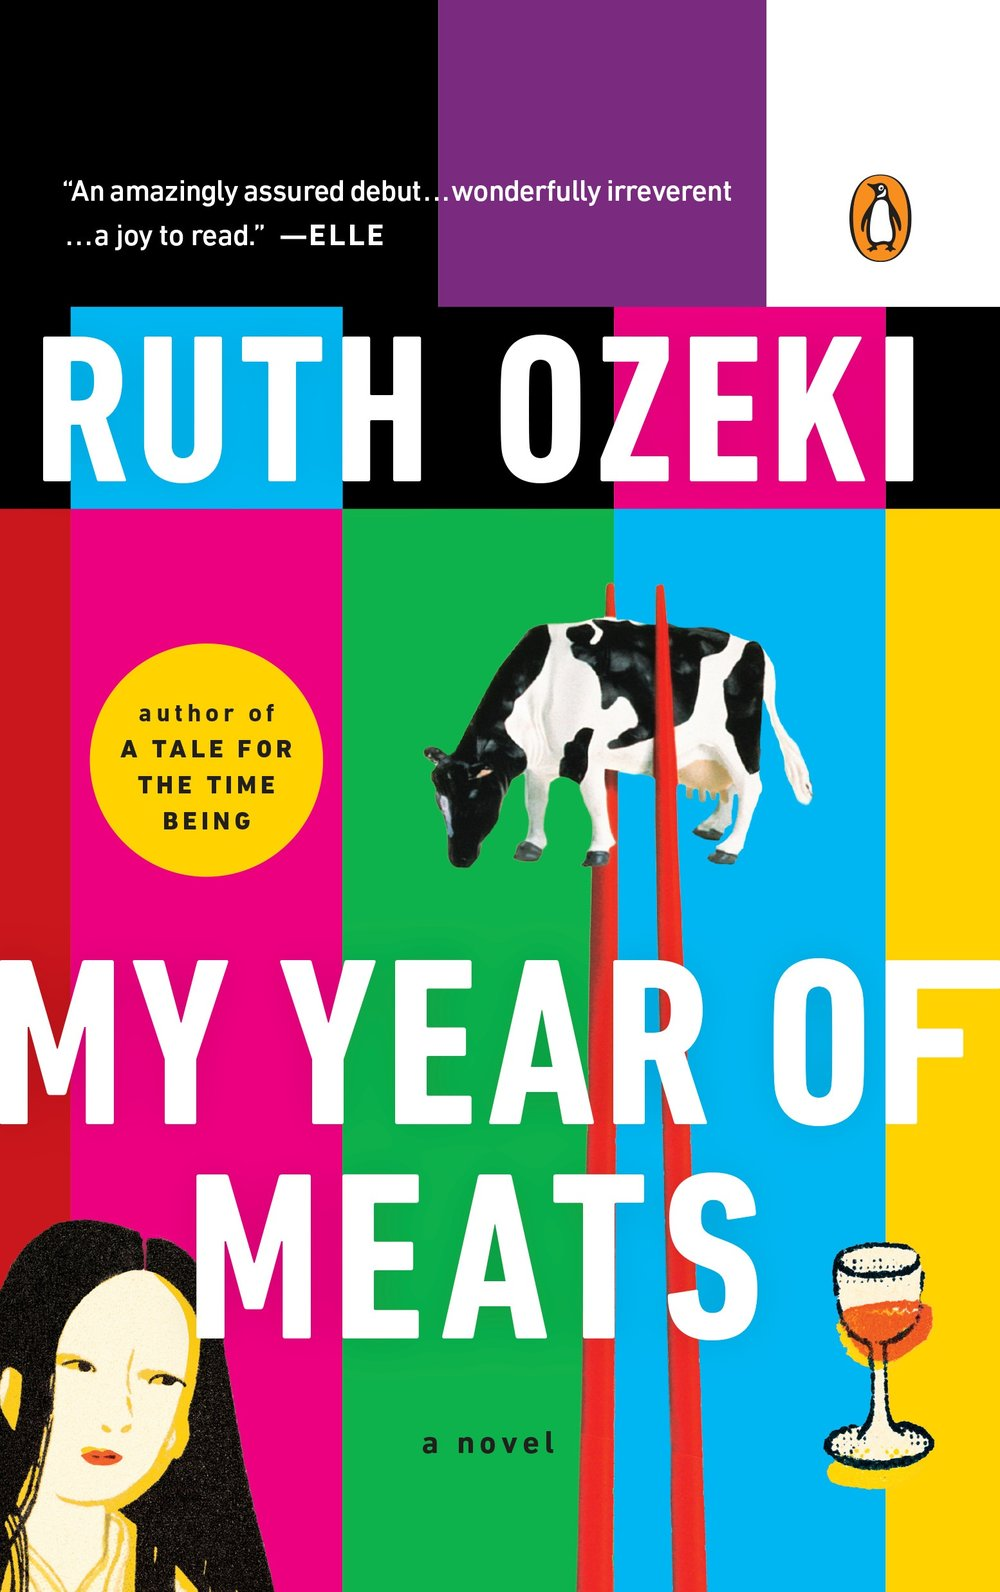 2018 Reprint Edition